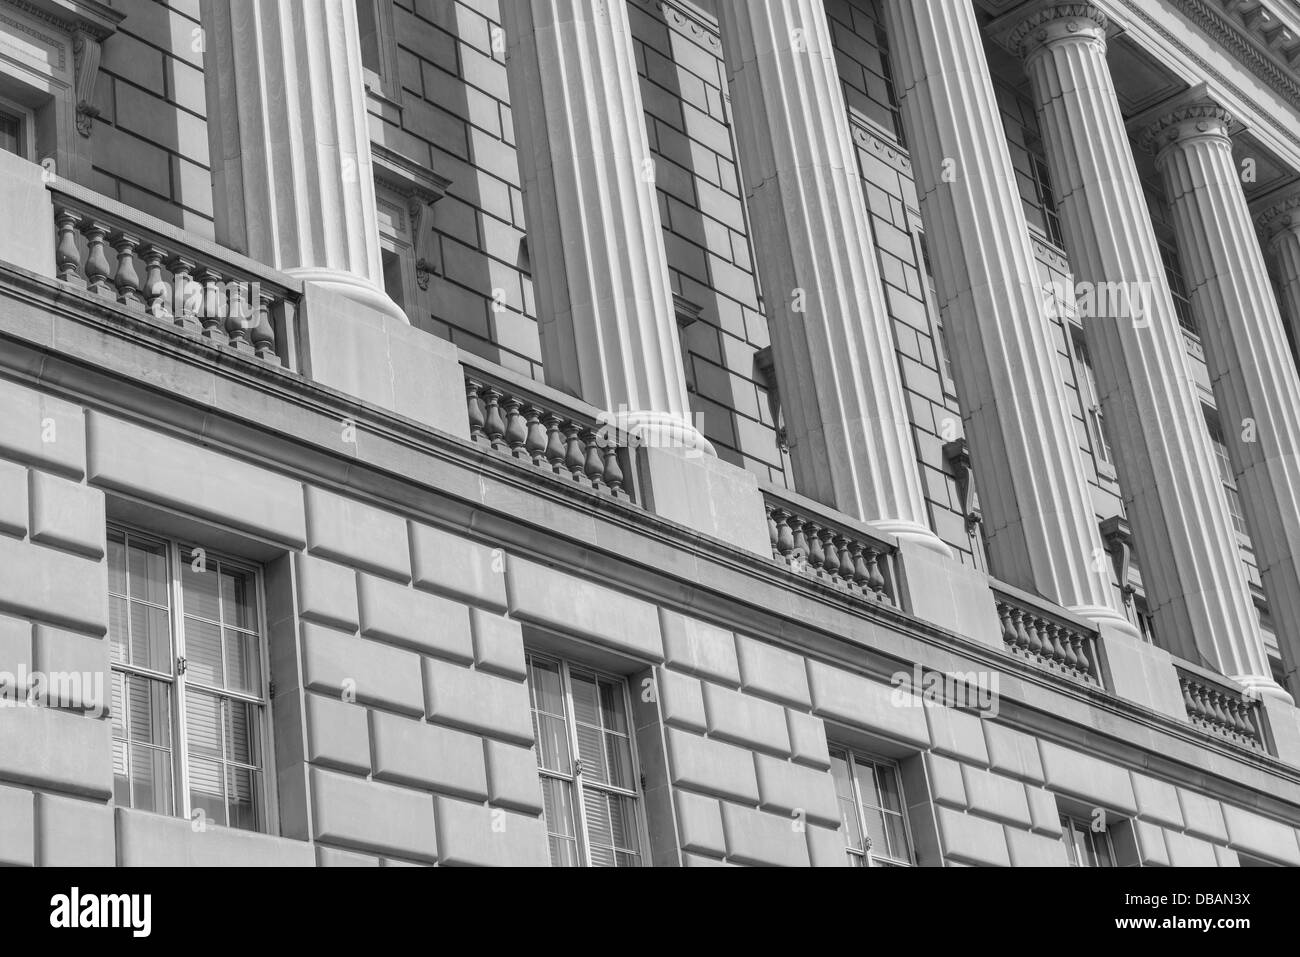 Pillars of Law - Stock Image